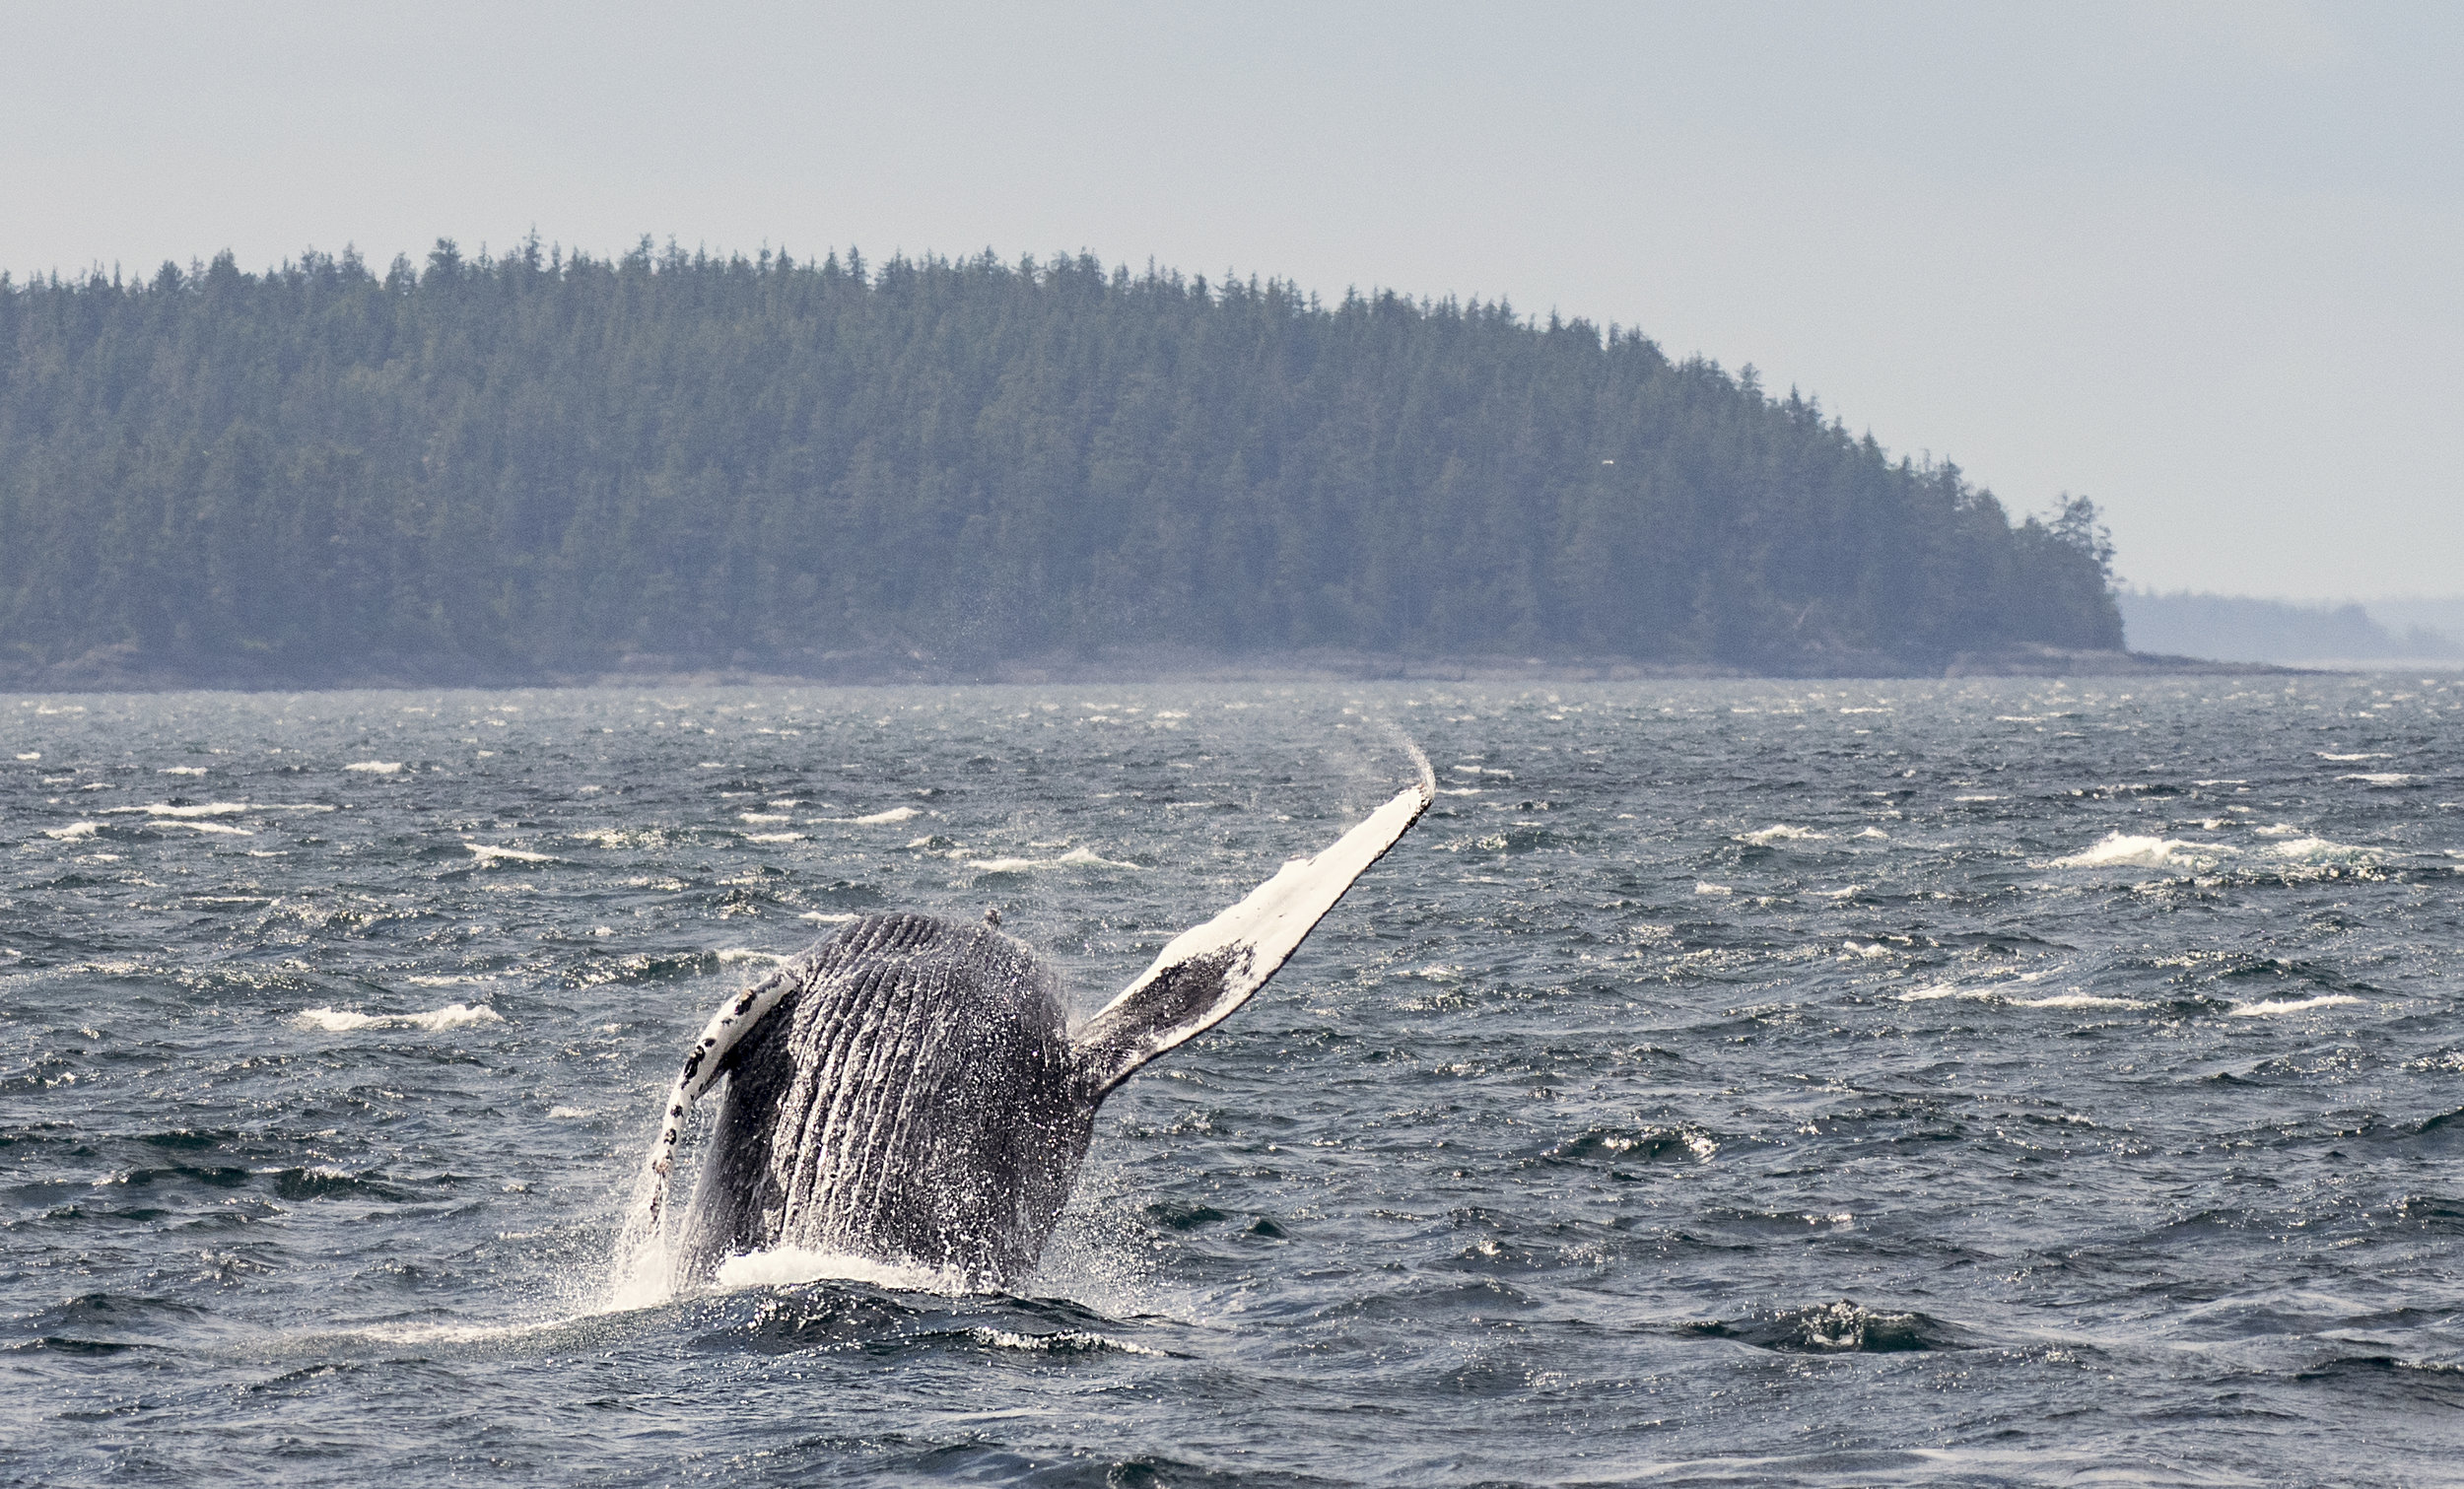 Humpback breaching and waving hello